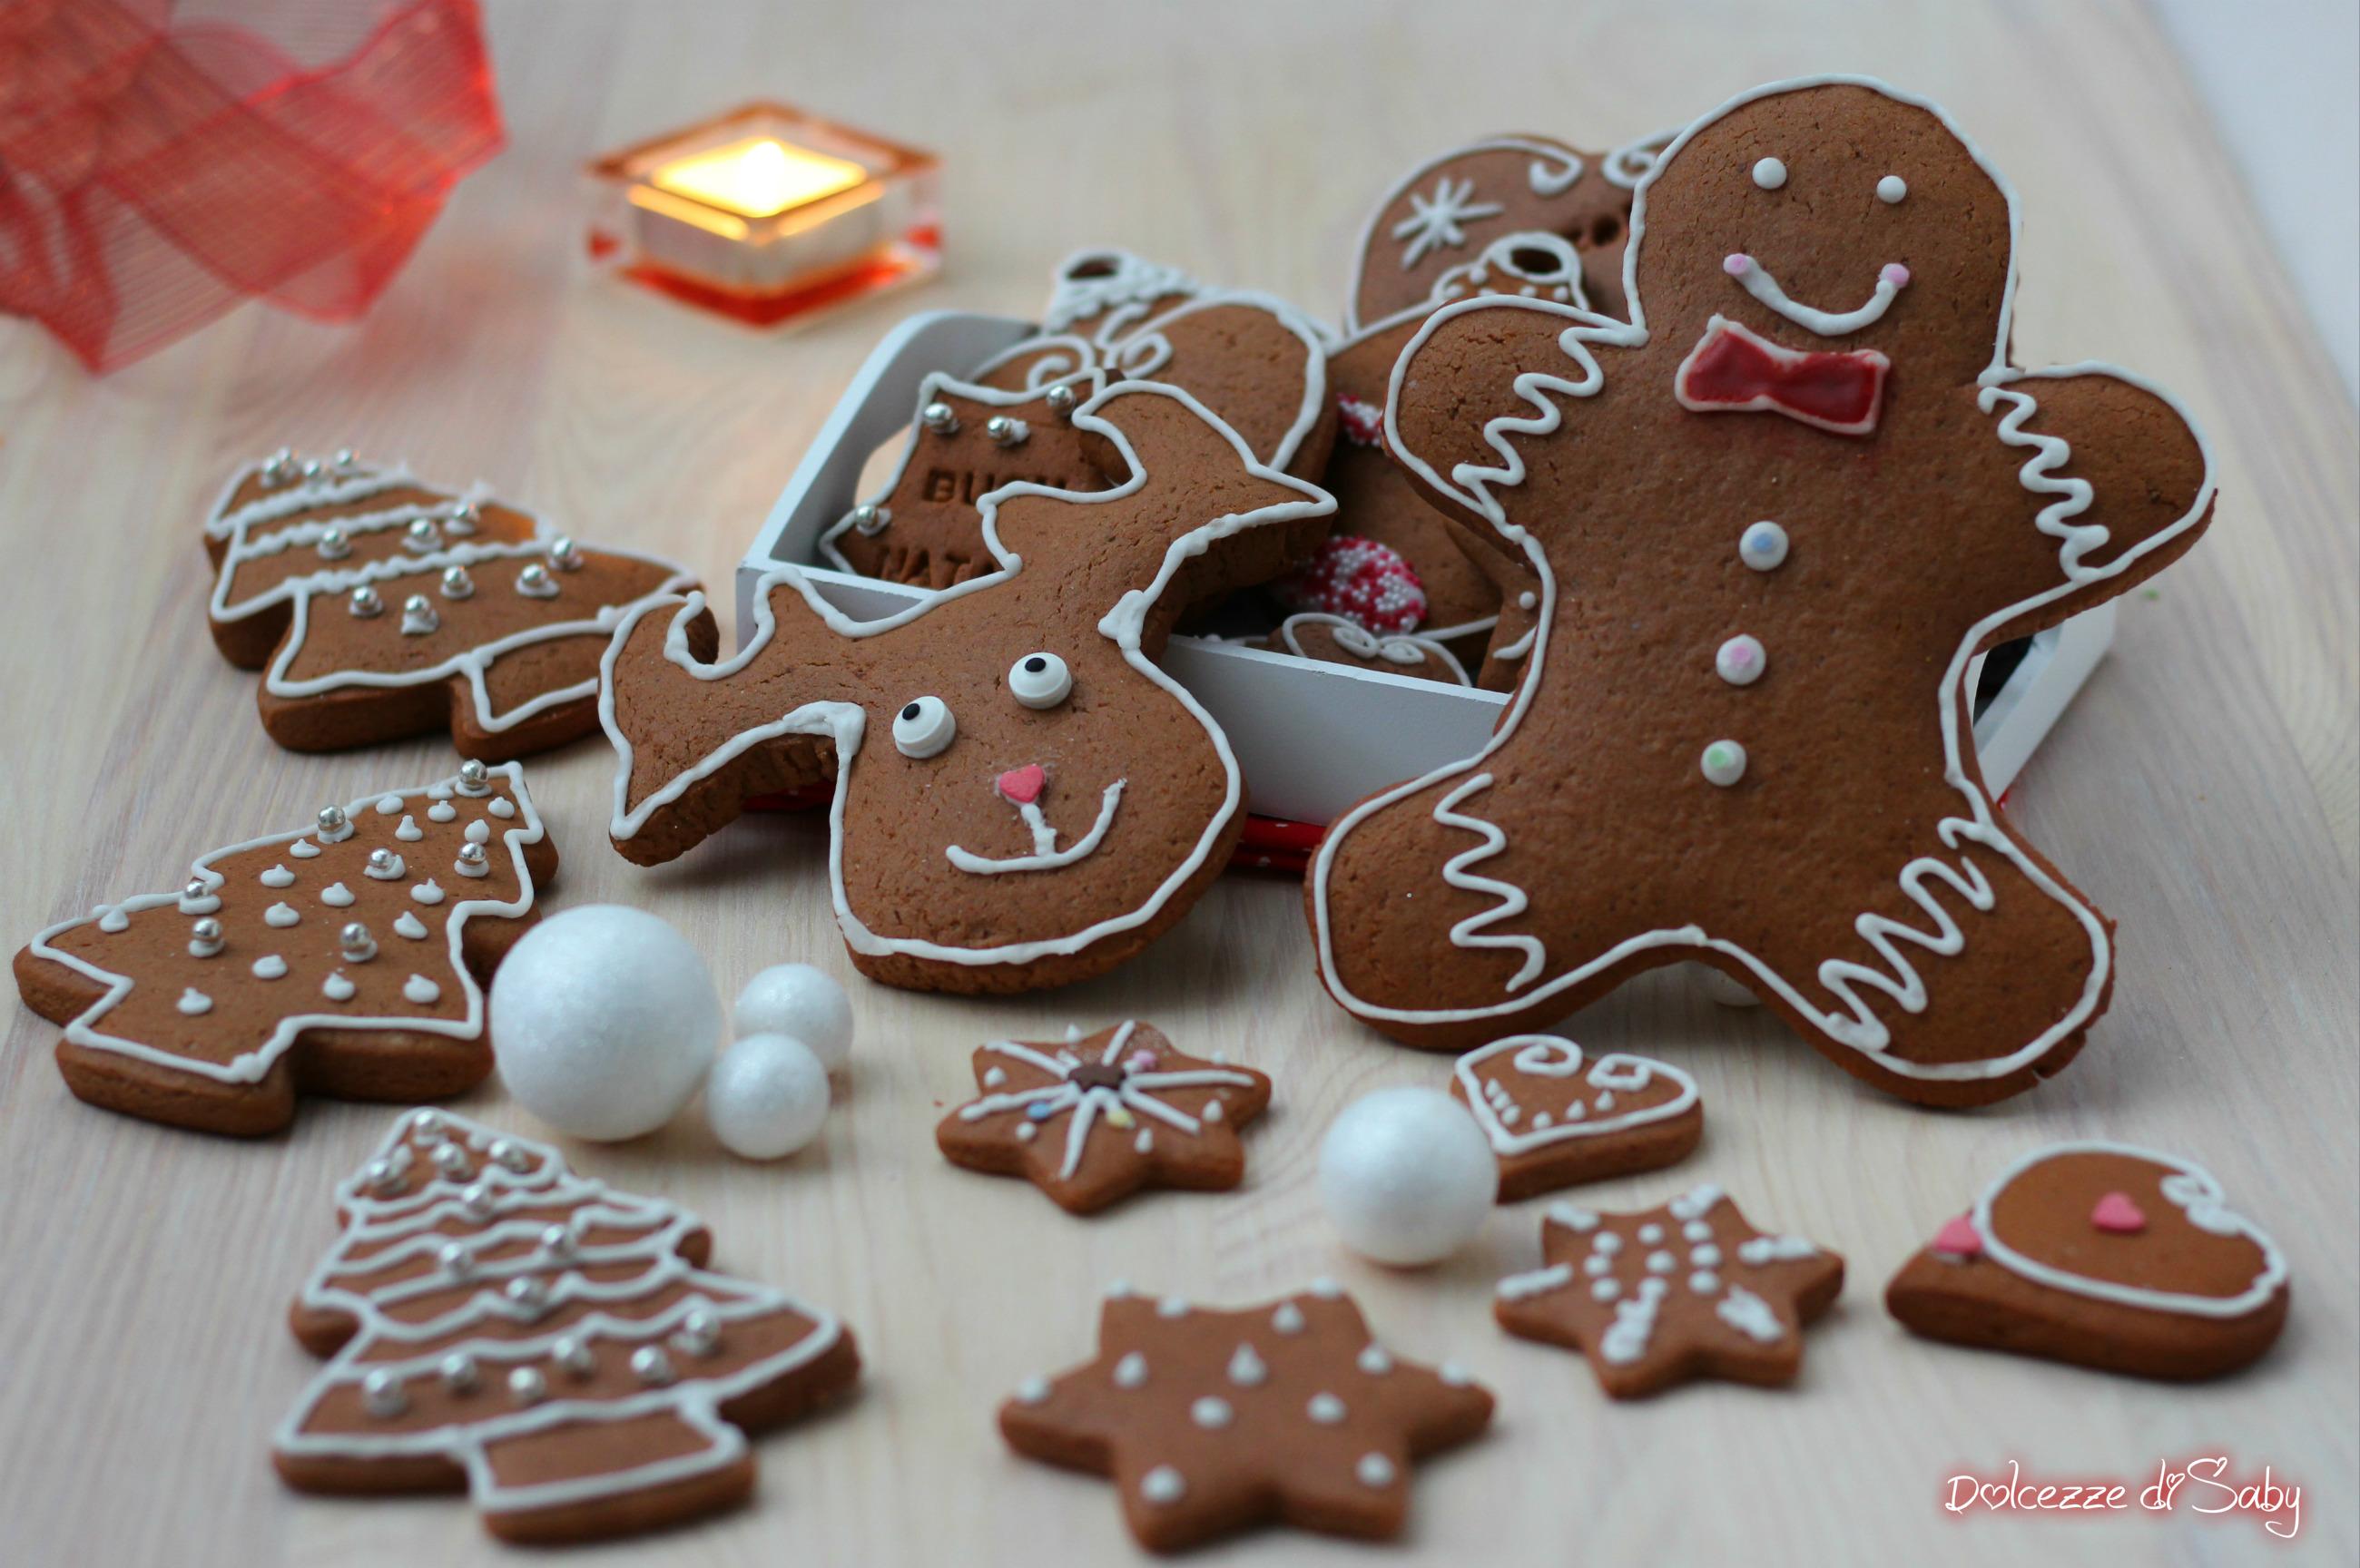 Biscotti Di Natale Tedeschi Ricetta.Biscotti Di Pan Di Zenzero Lebkuchen O Gingerbread Ricetta Tedesca